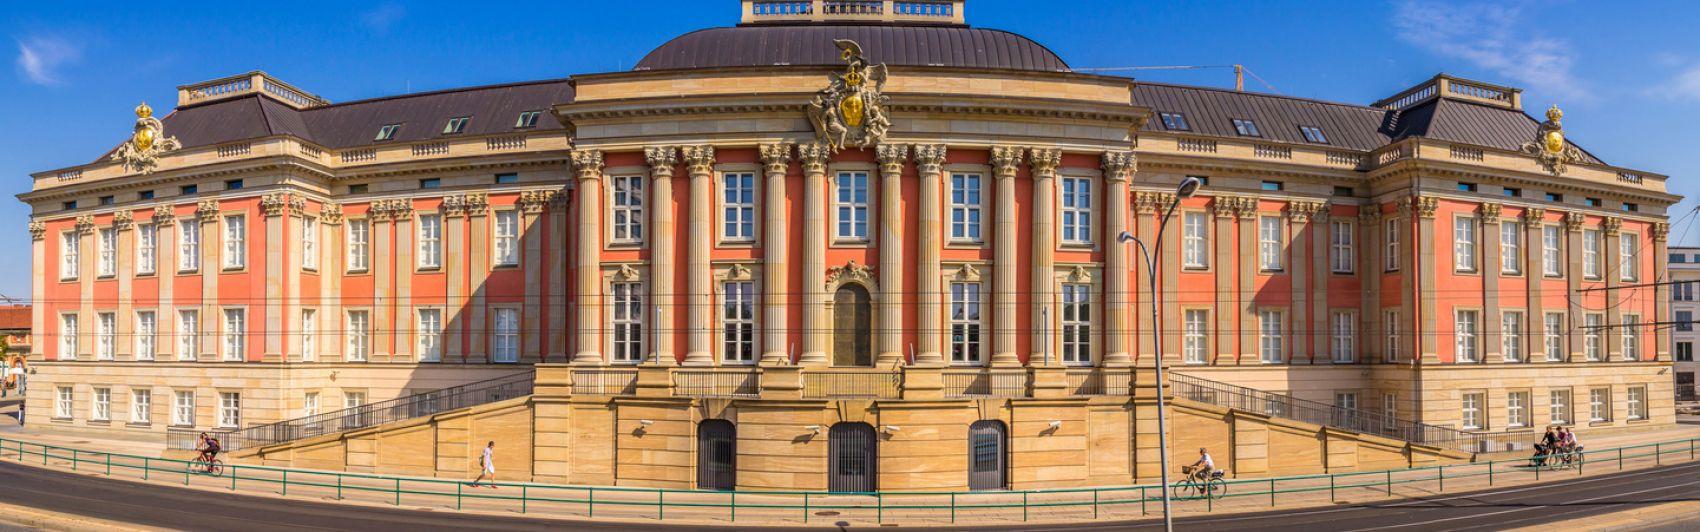 Brandenburg Landtag Potsdam